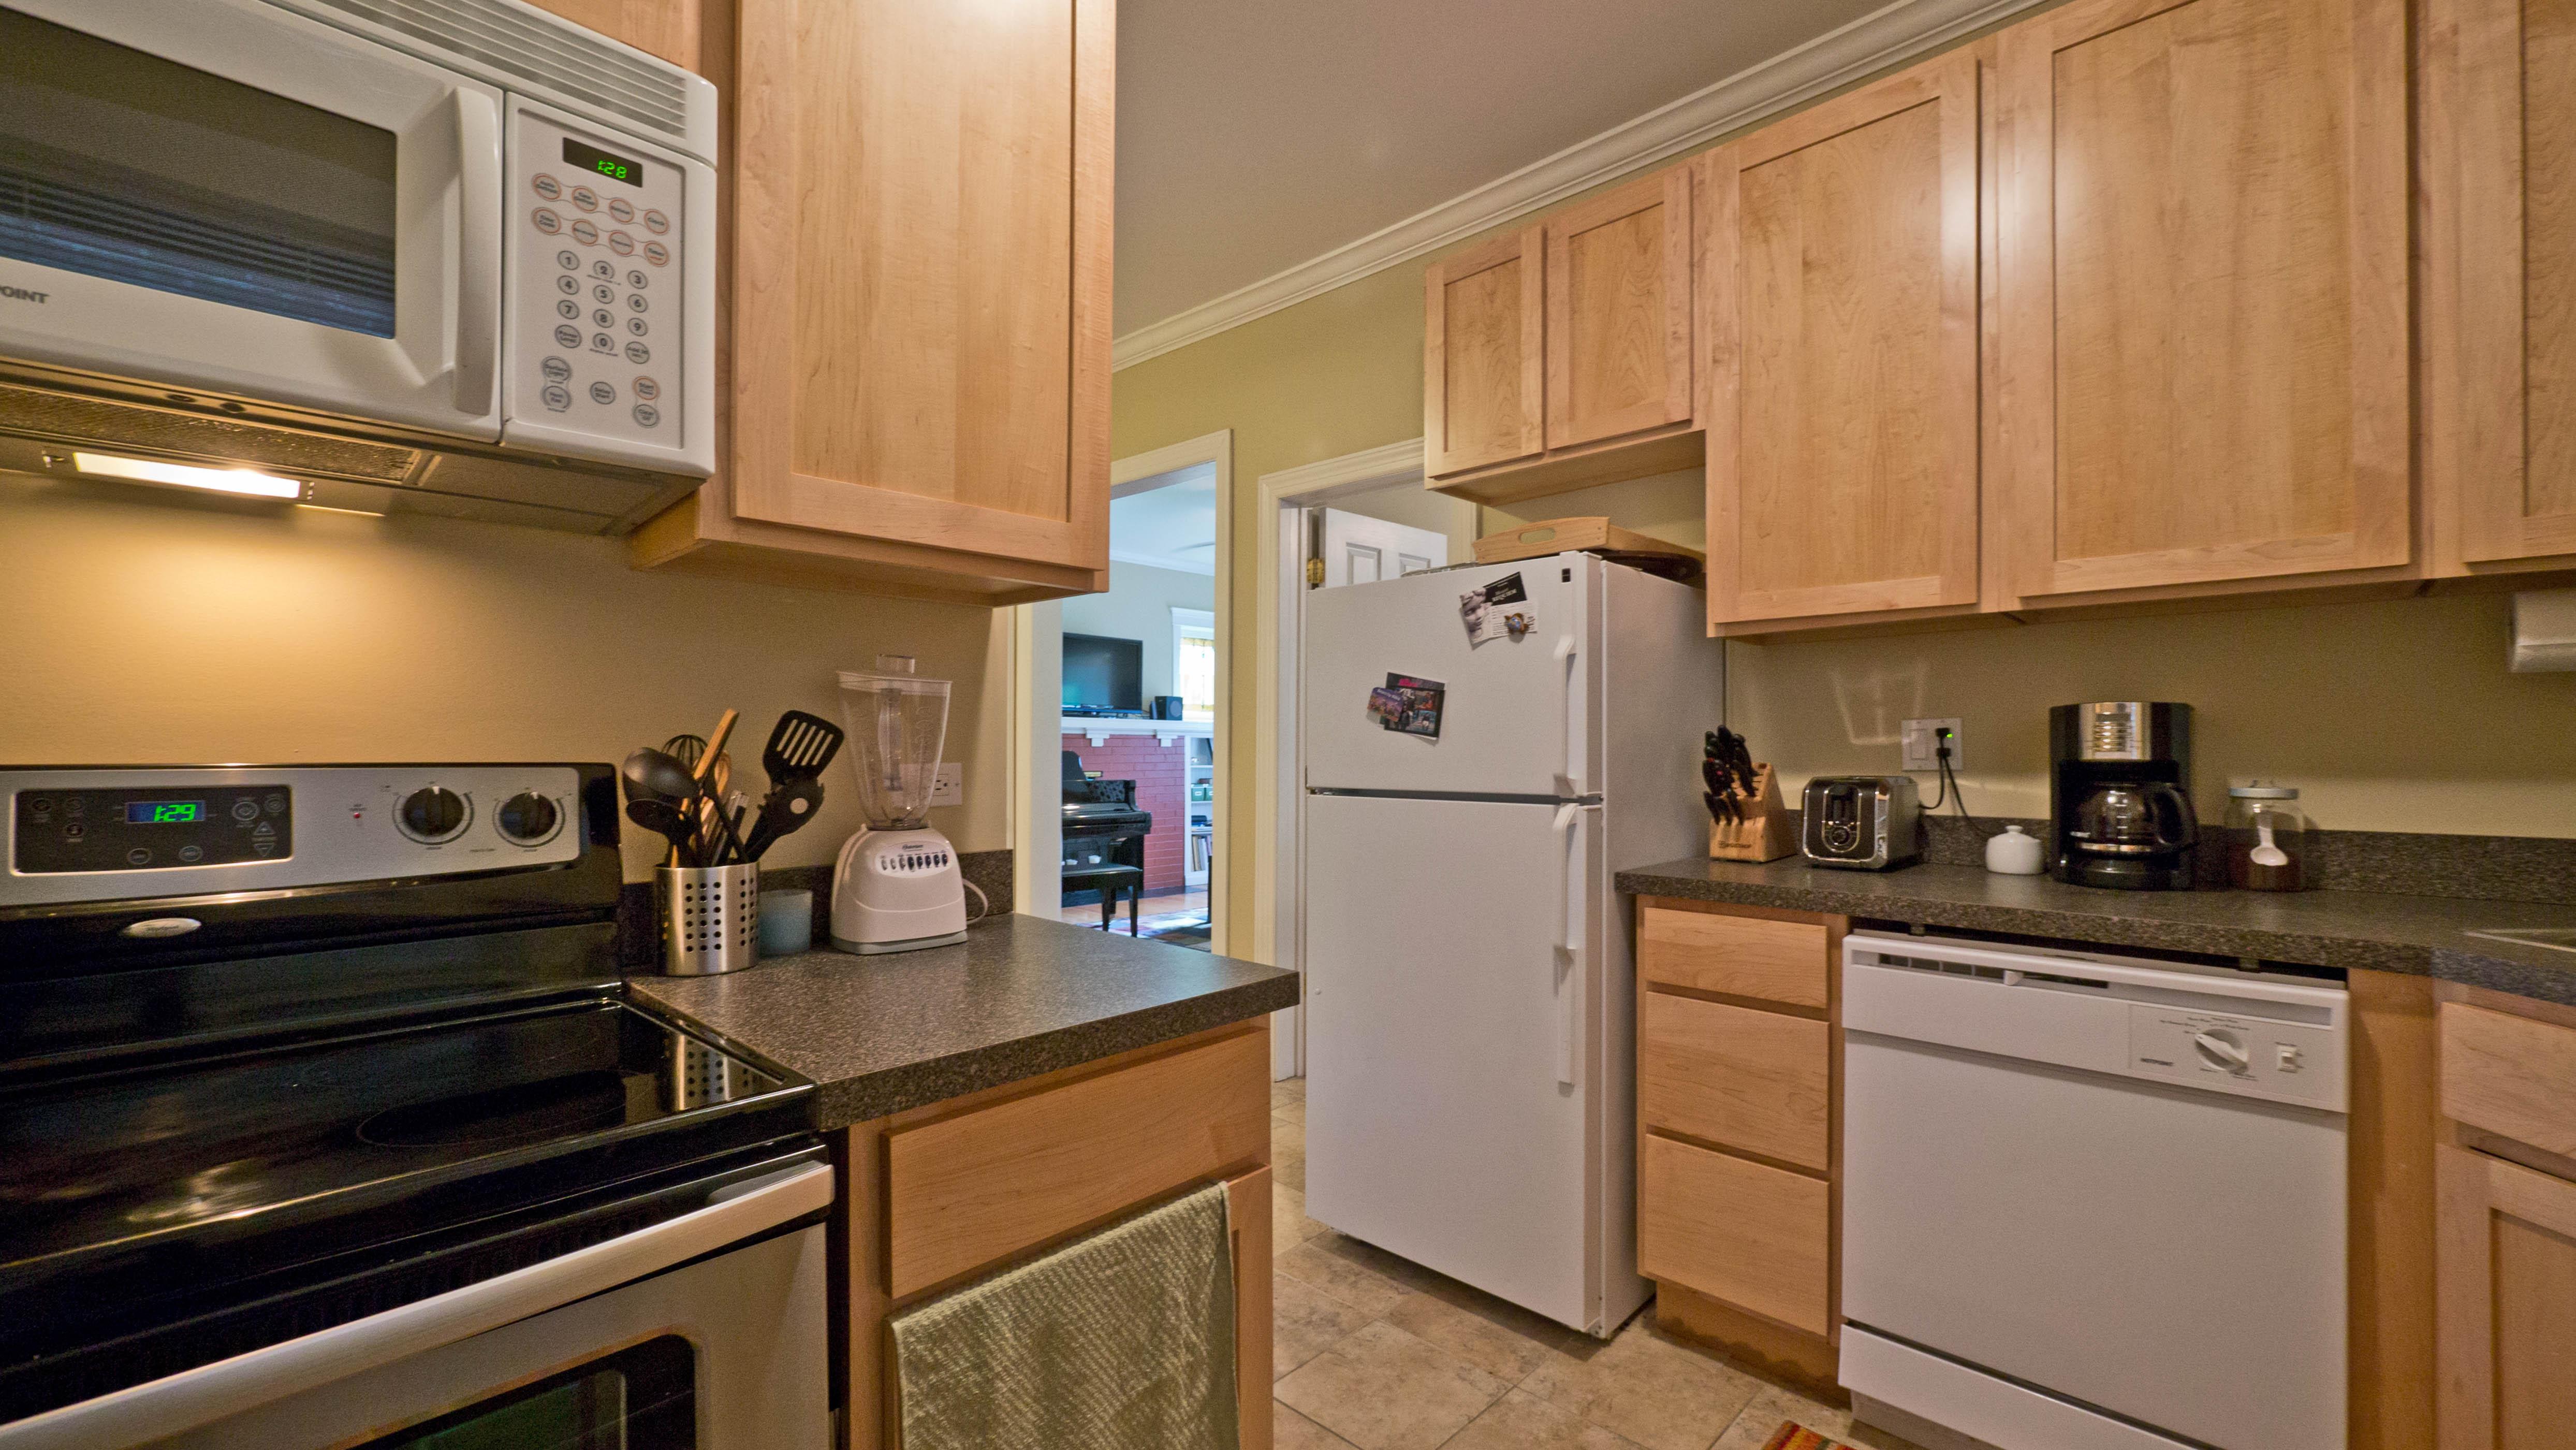 Evanston apartment review, 1576 Oak Ave – YoChicago